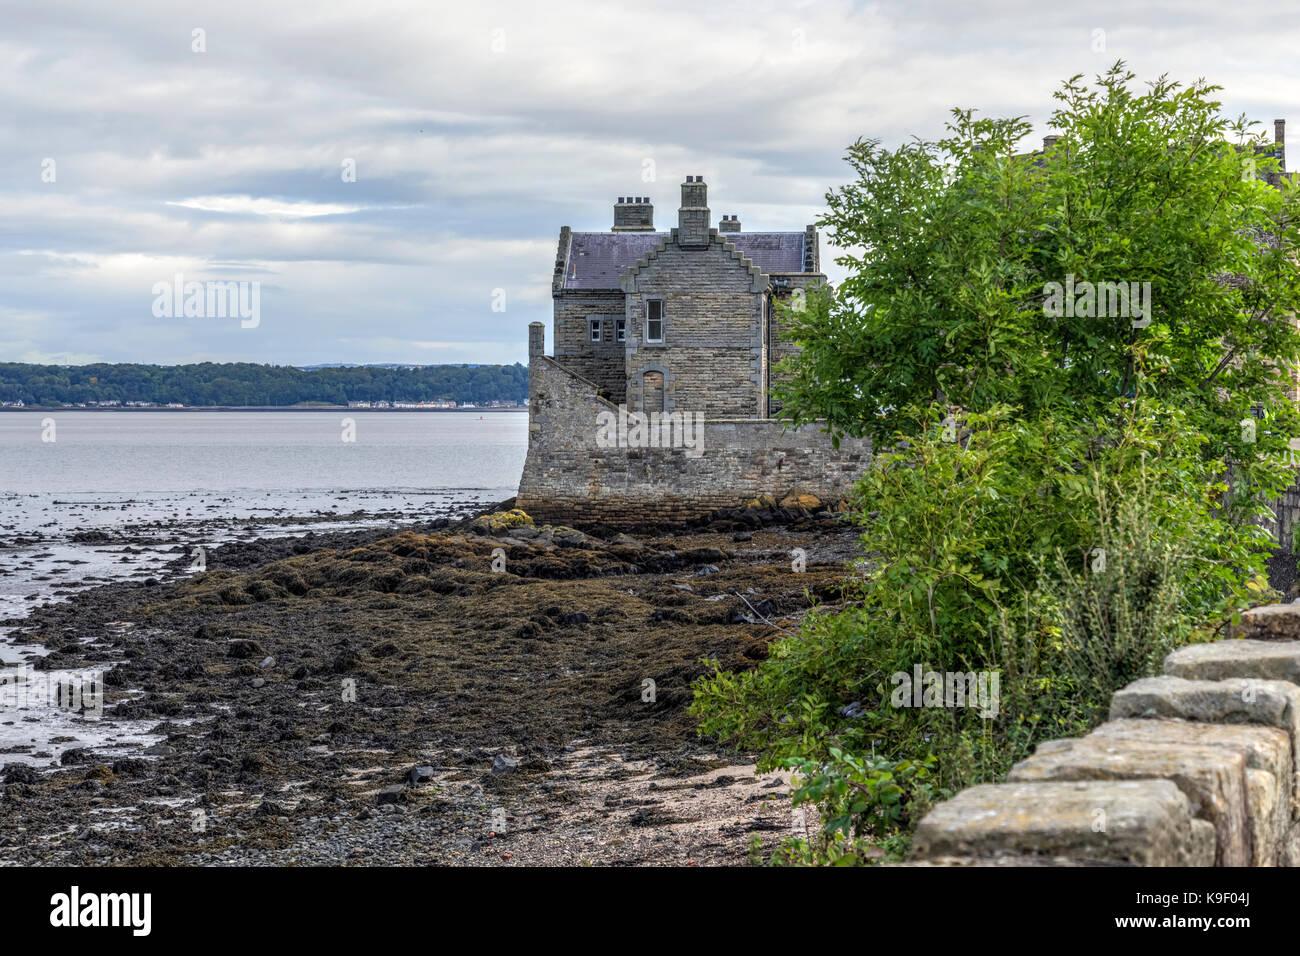 Blackness Castle, Falkirk, Scotland, United Kingdom - Stock Image